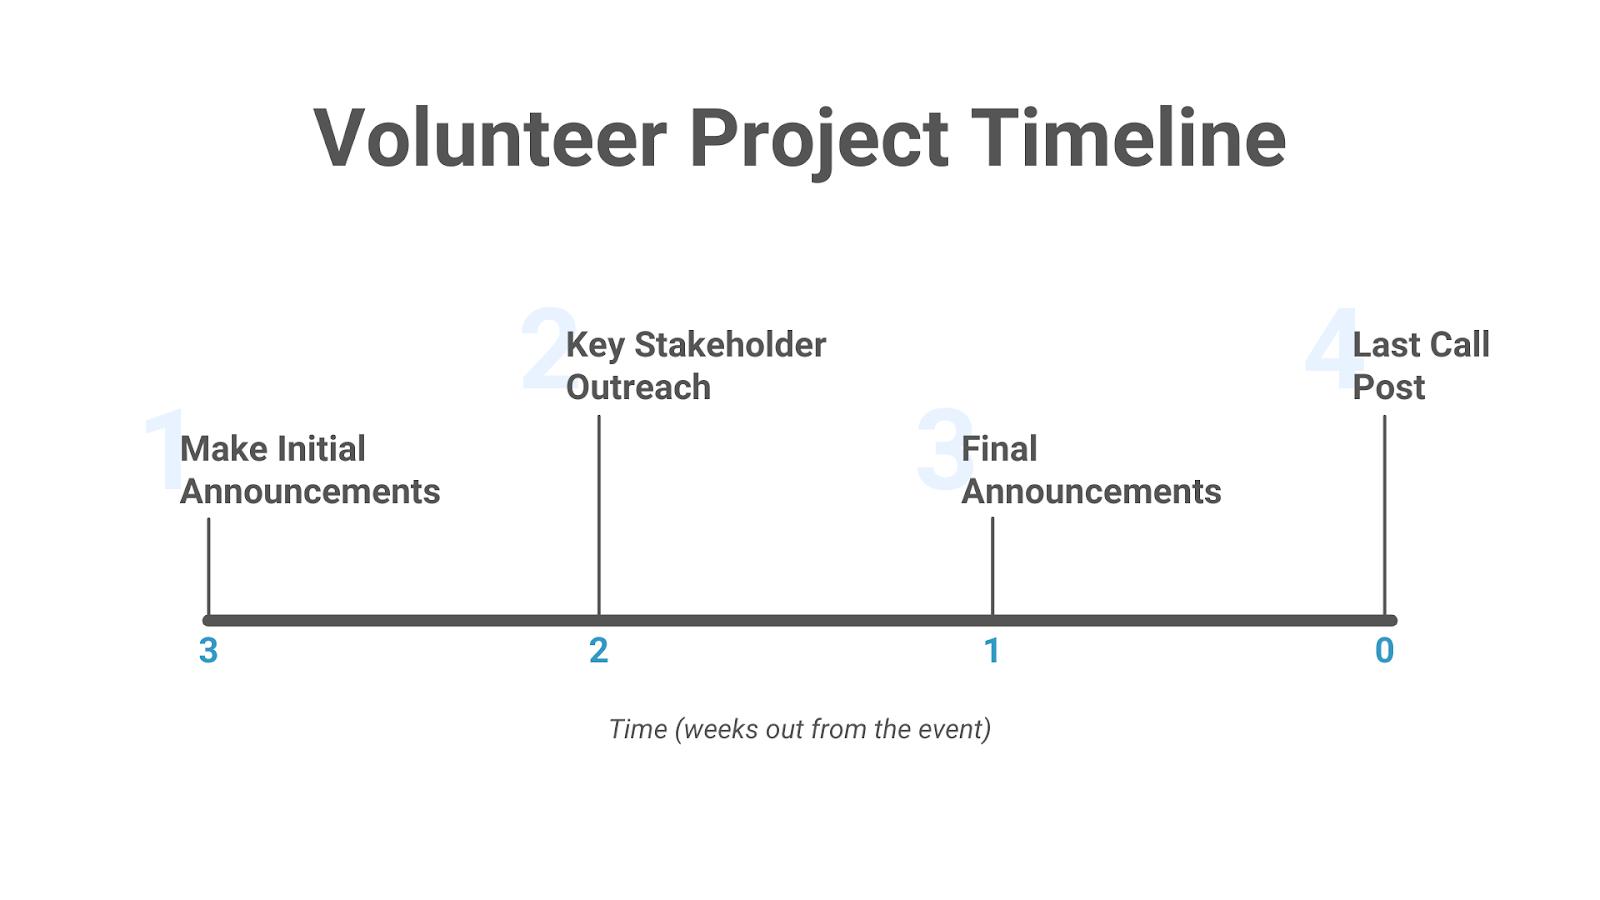 Volunteer Project Timeline